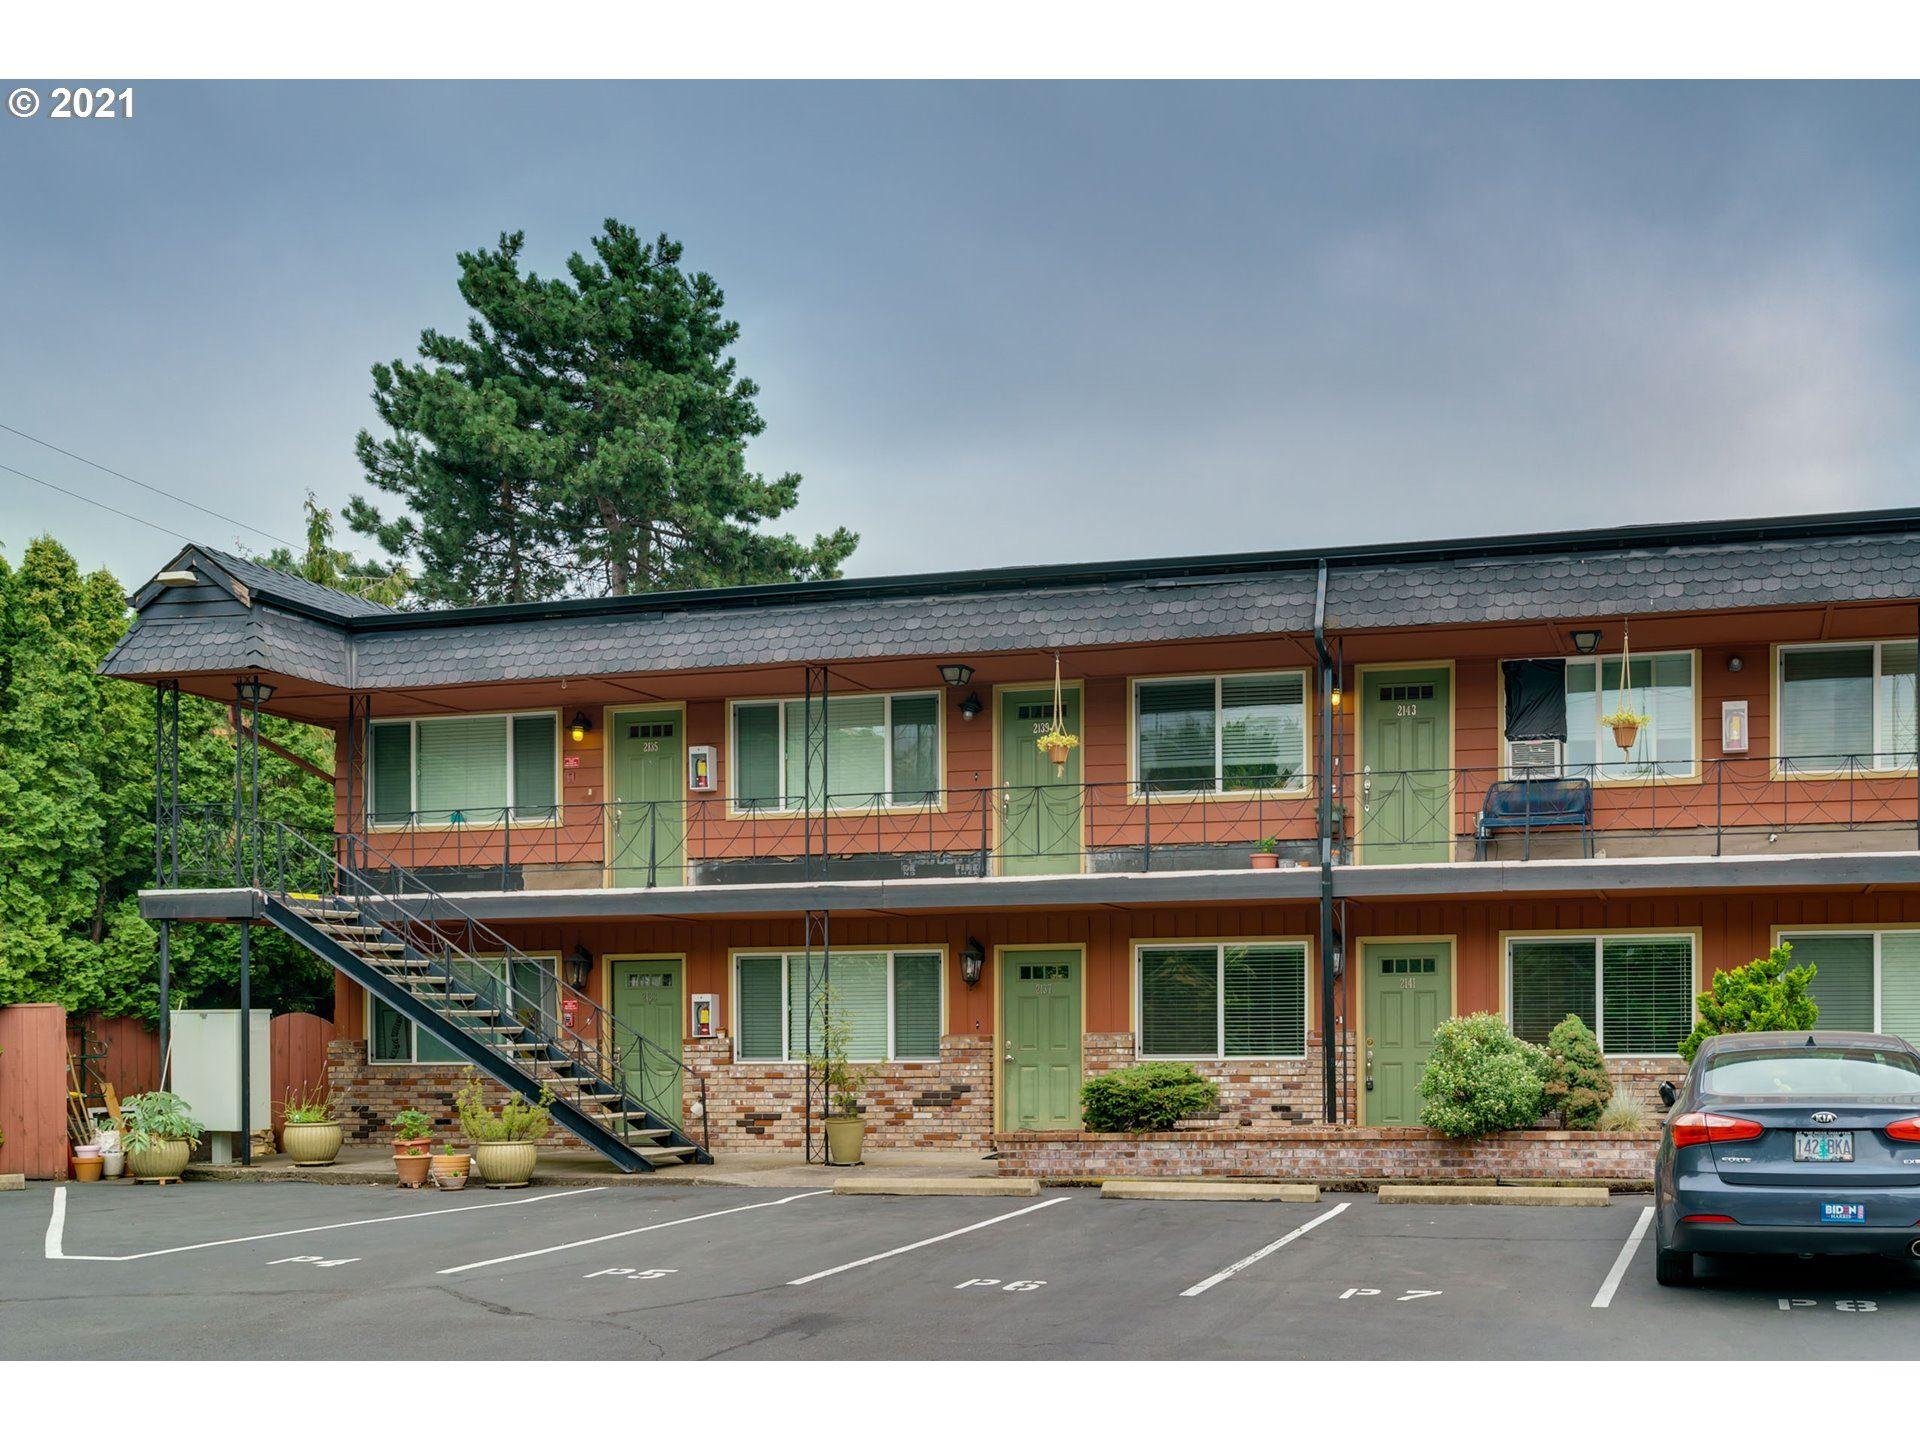 2141 NE WEIDLER ST, Portland, OR 97232 - MLS#: 21091273